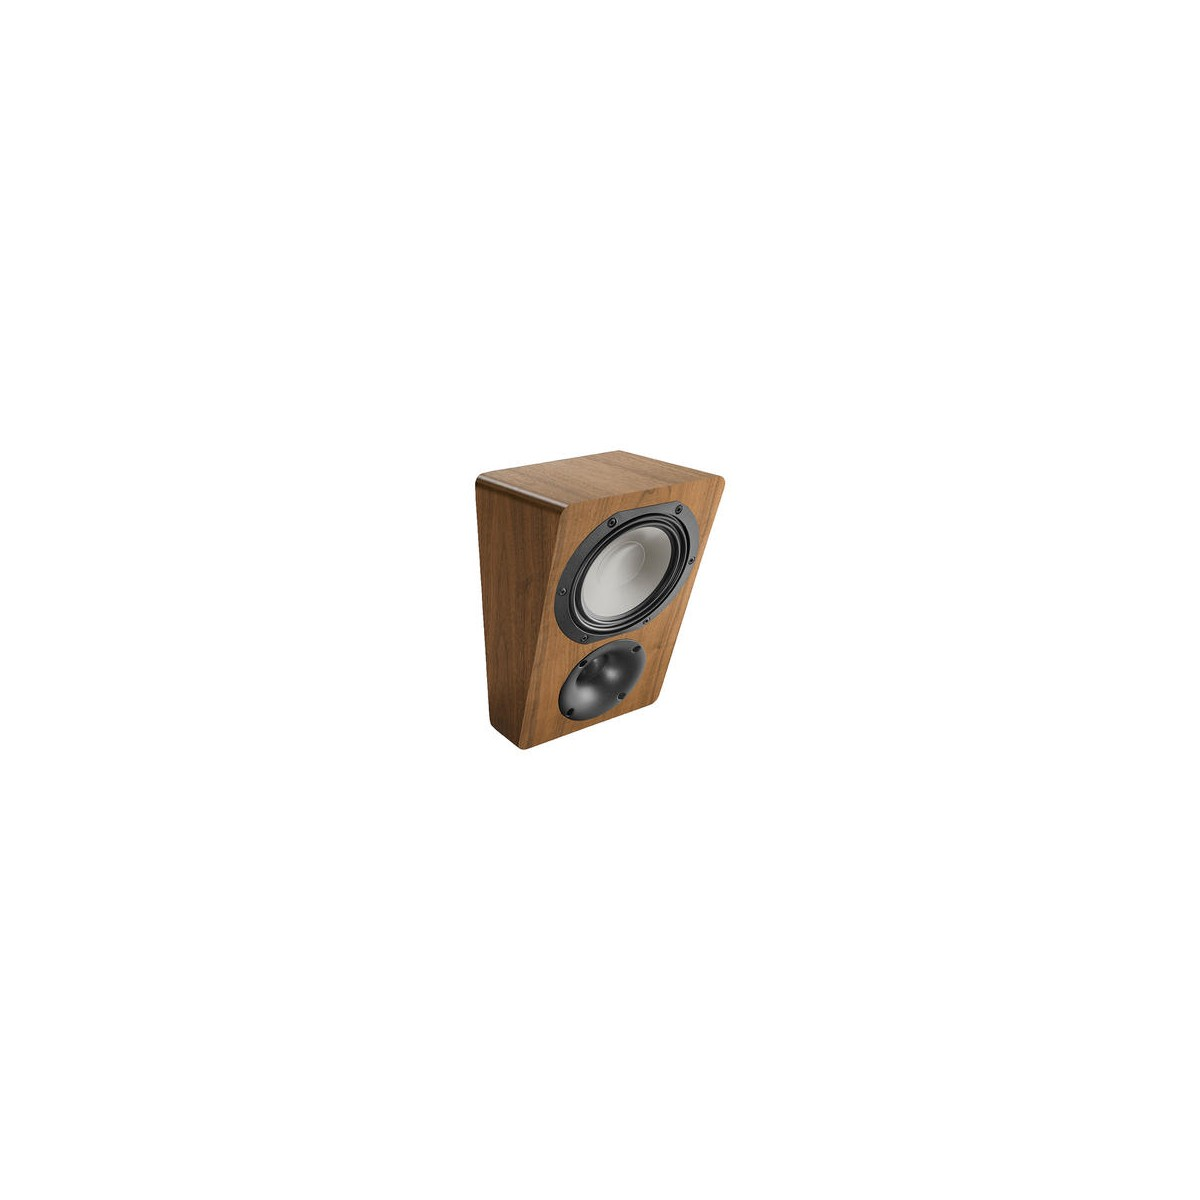 Lautsprecher Dolby Atmos® TOWNUS AR 5 WOOD (Paarpreis)